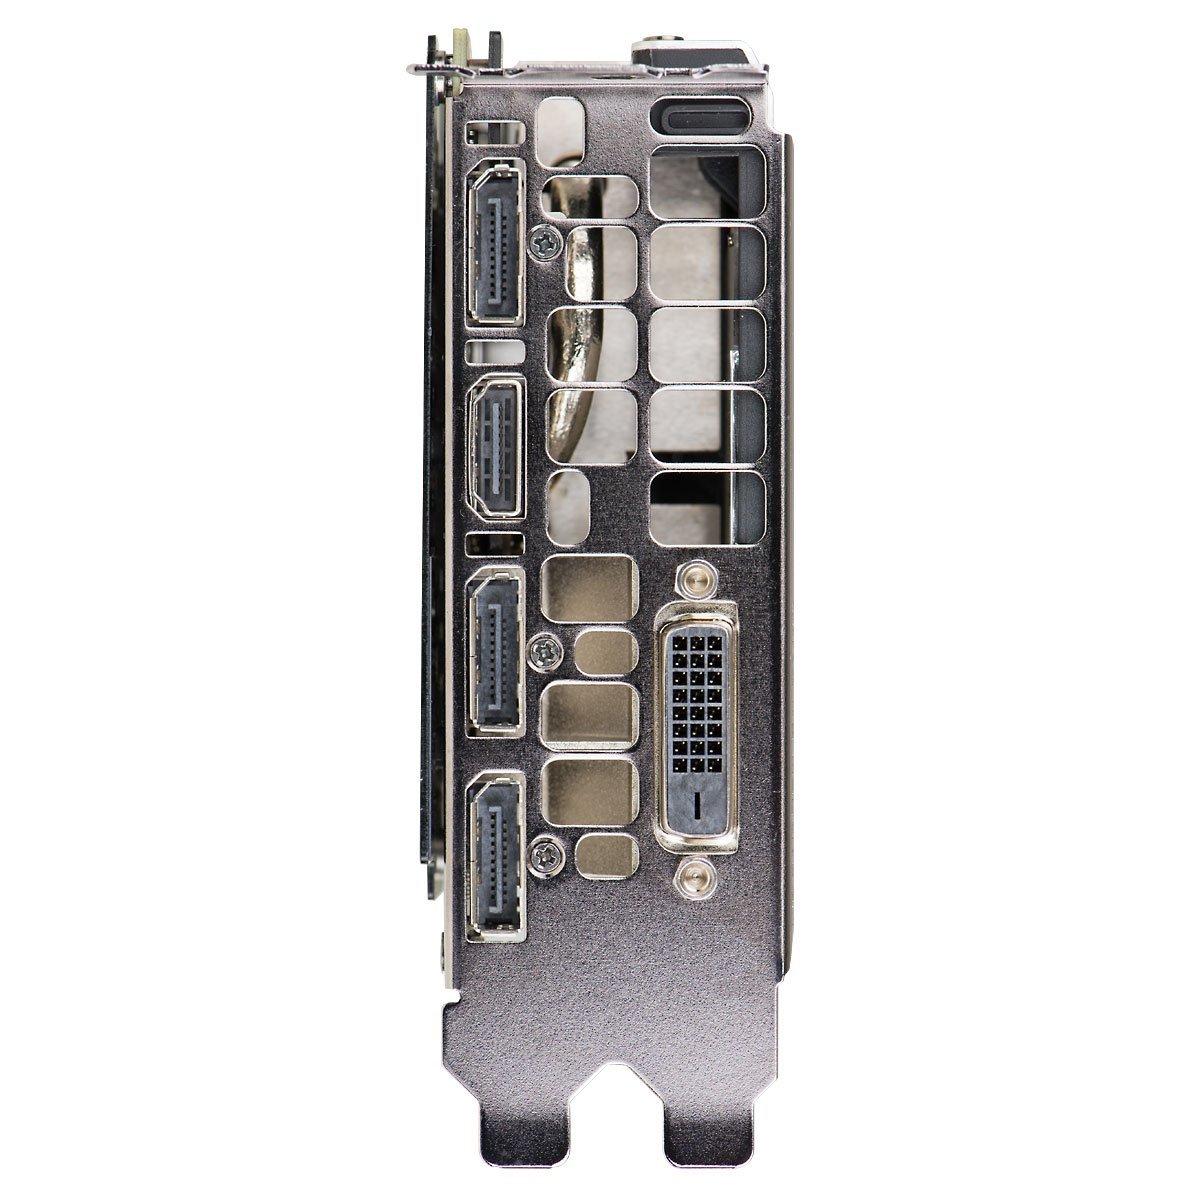 EVGA GeForce GTX 1080 SC GAMING ACX 3 0, 8GB GDDR5X, LED, DX12 OSD Support  (PXOC) Graphics Card 08G-P4-6183-KR